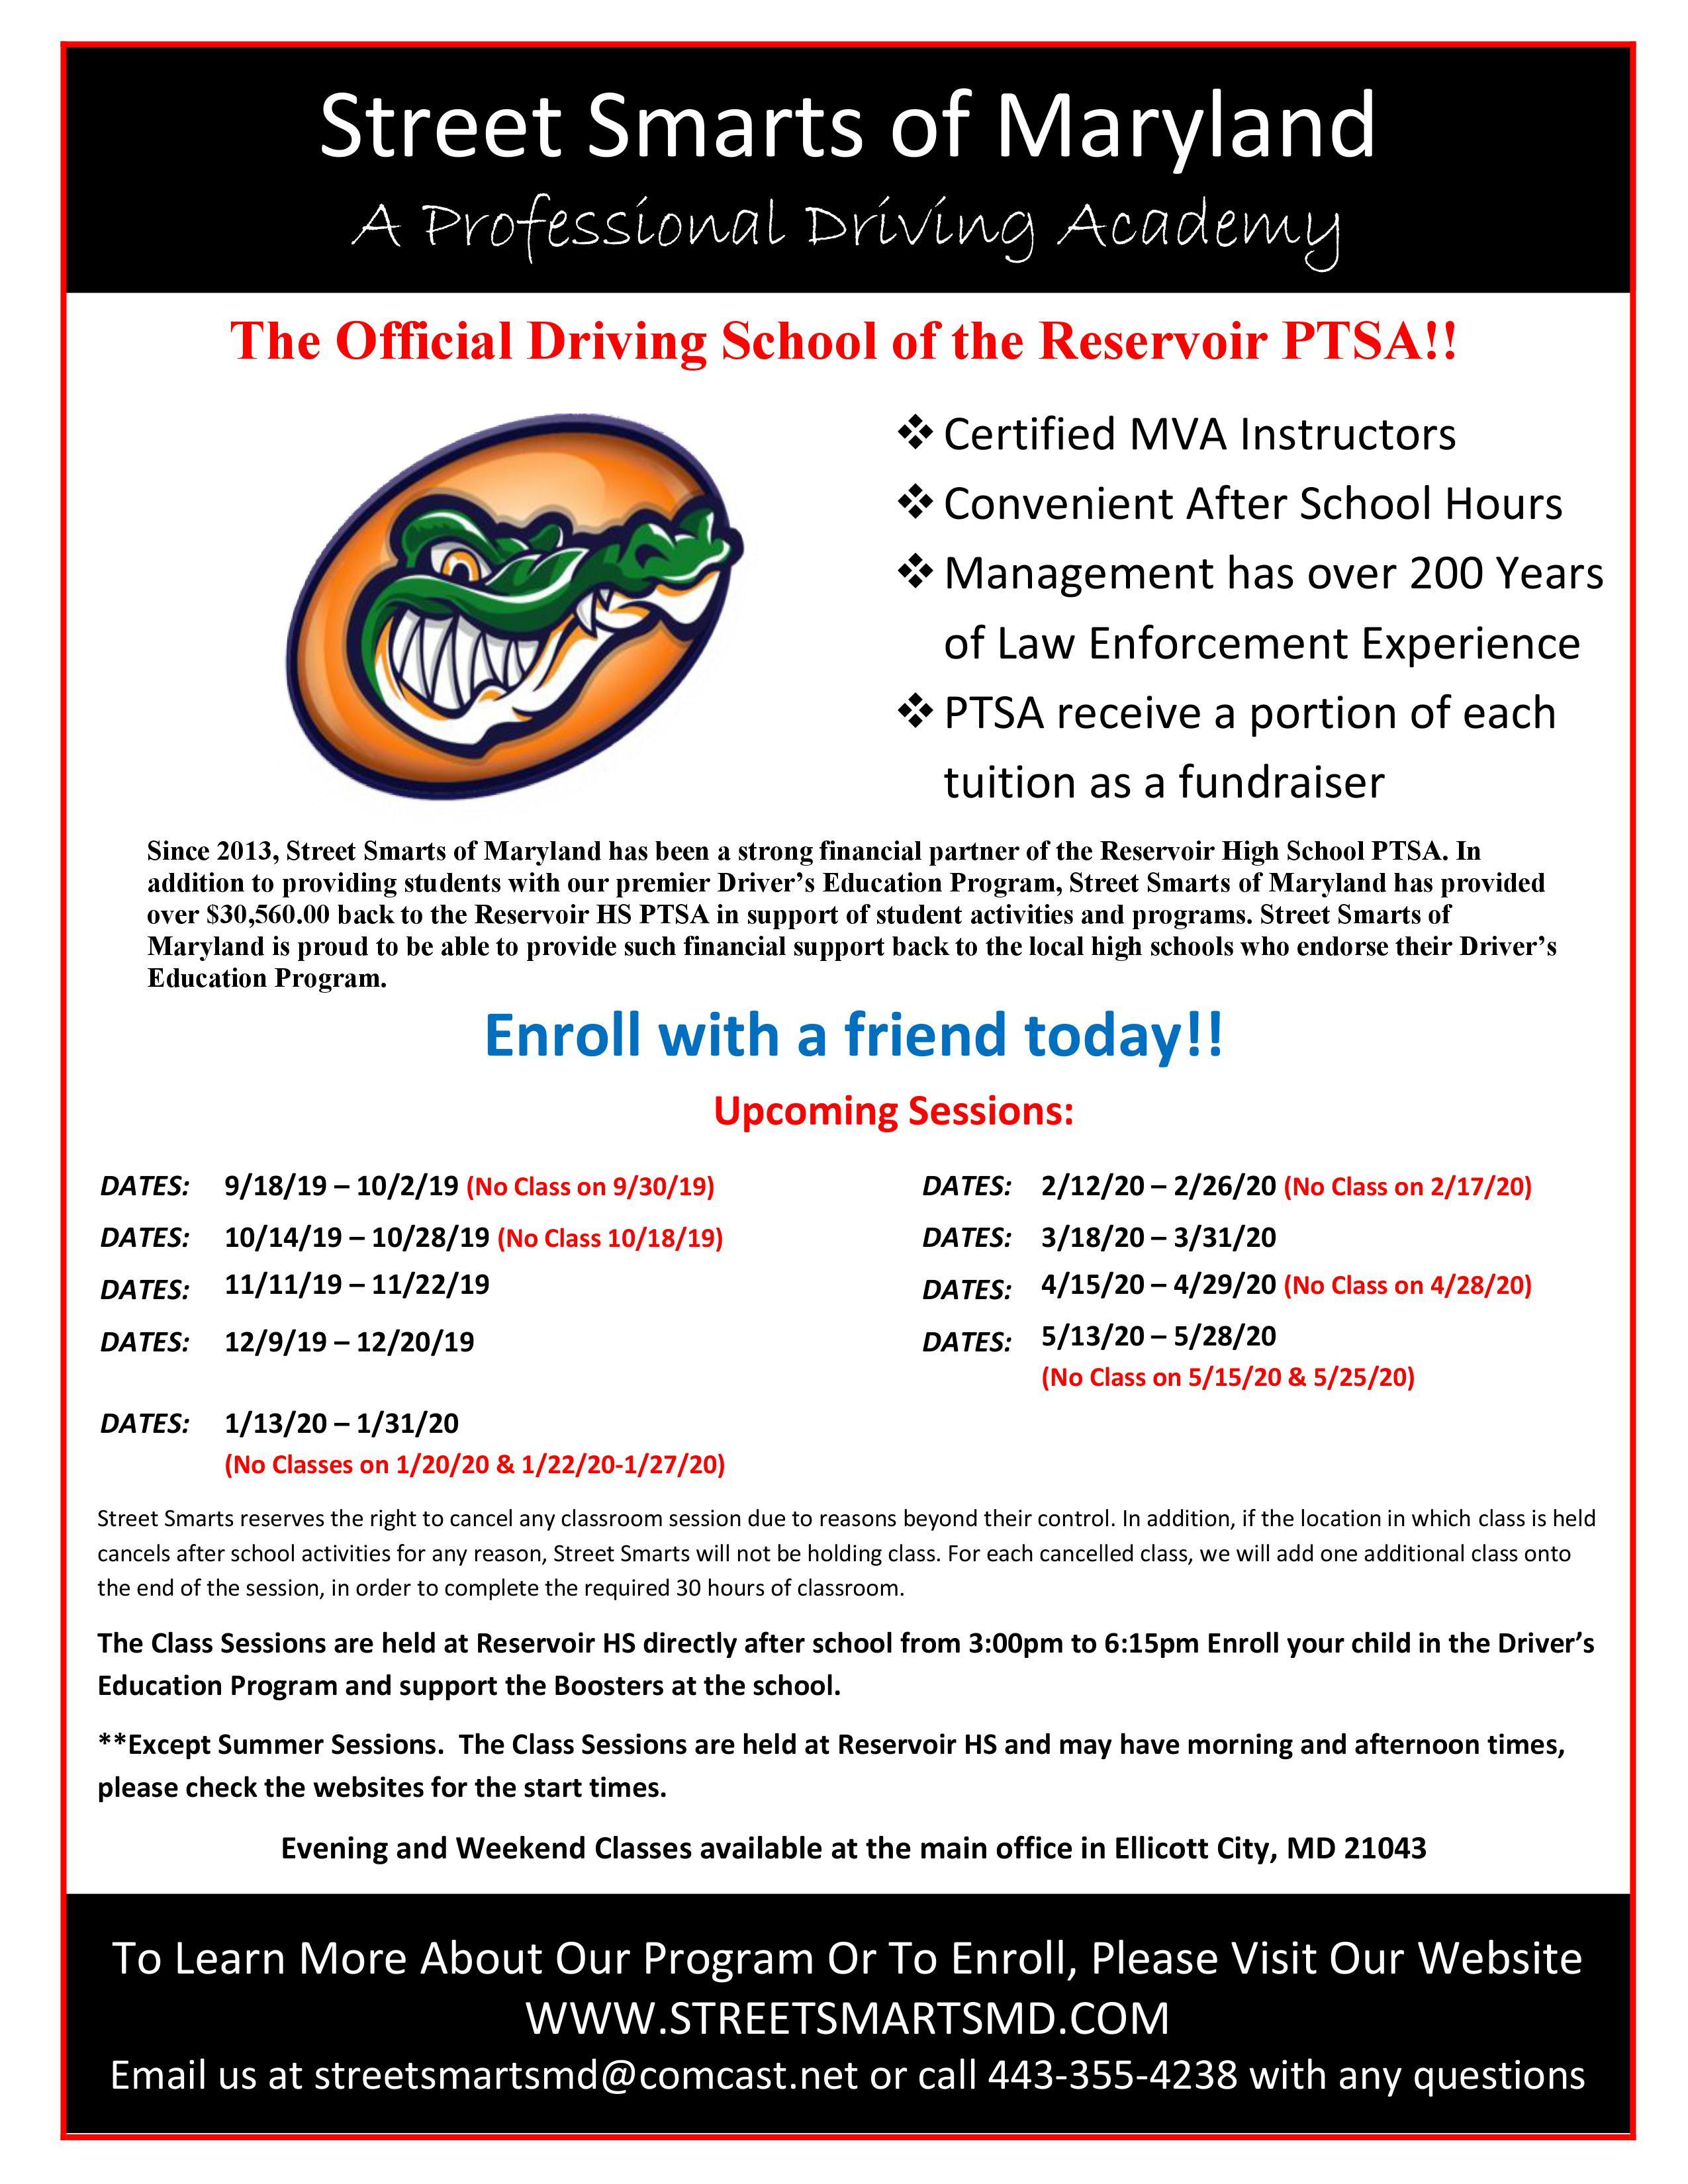 RHS_Street_Smarts_Drivers_Ed_Flyer